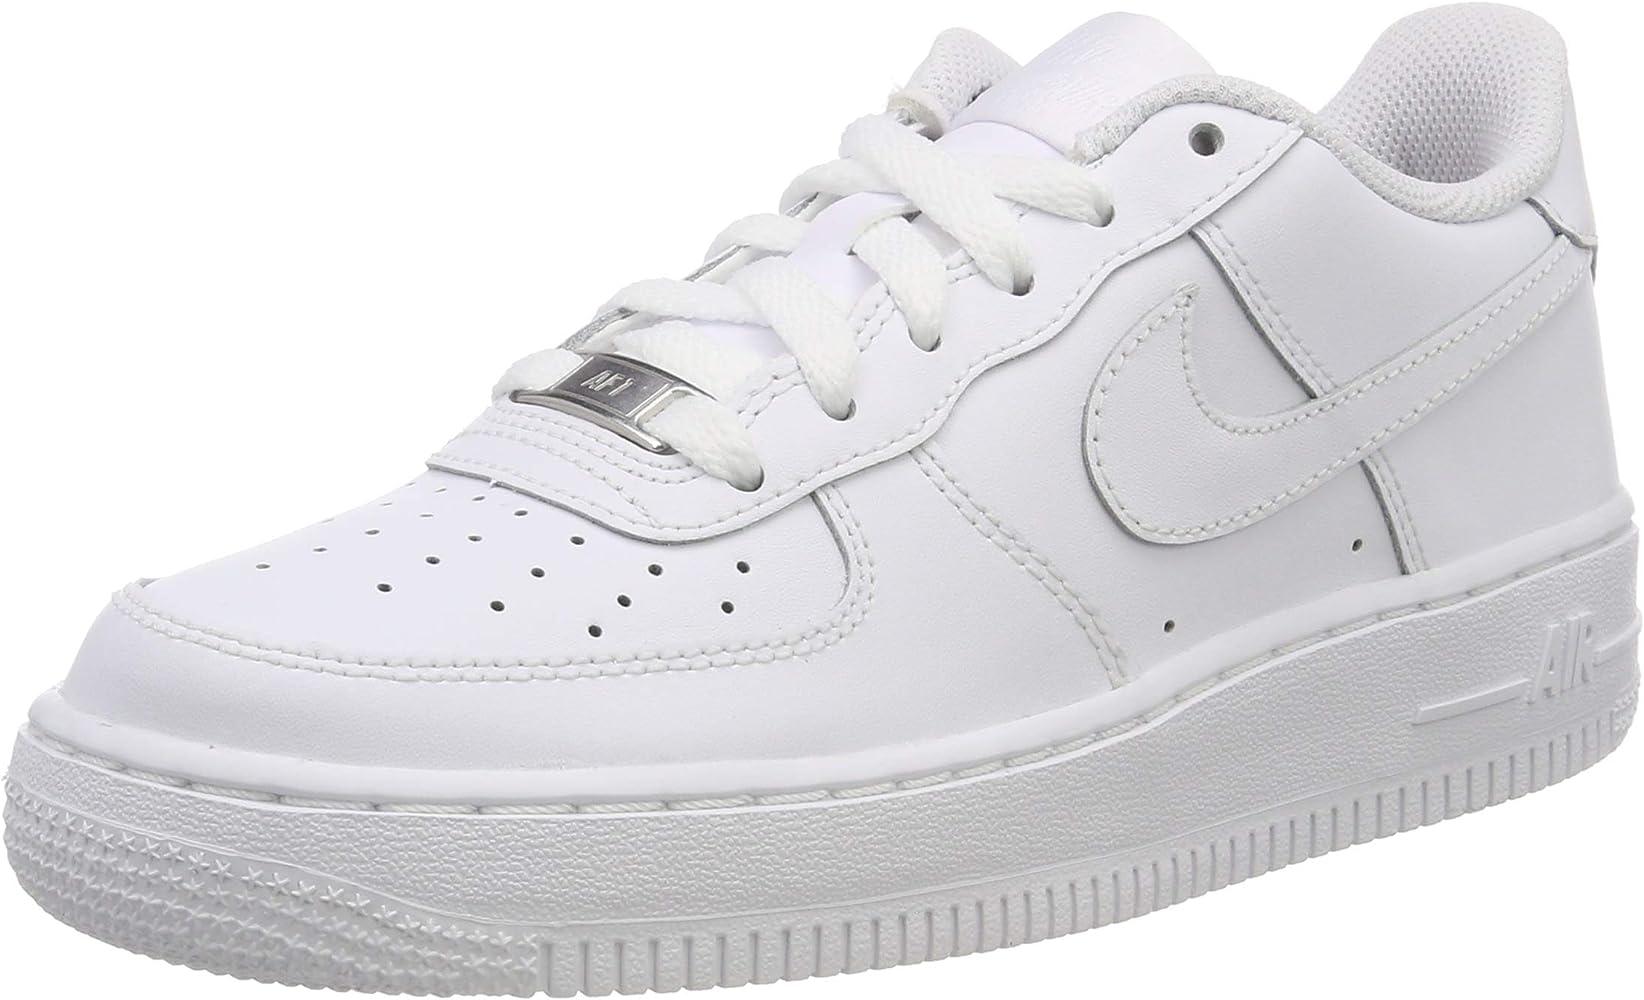 meilleur site web 48cc0 746bf Nike Air Force 1 (Gs), Chaussures de sport garçon, Blanc ...